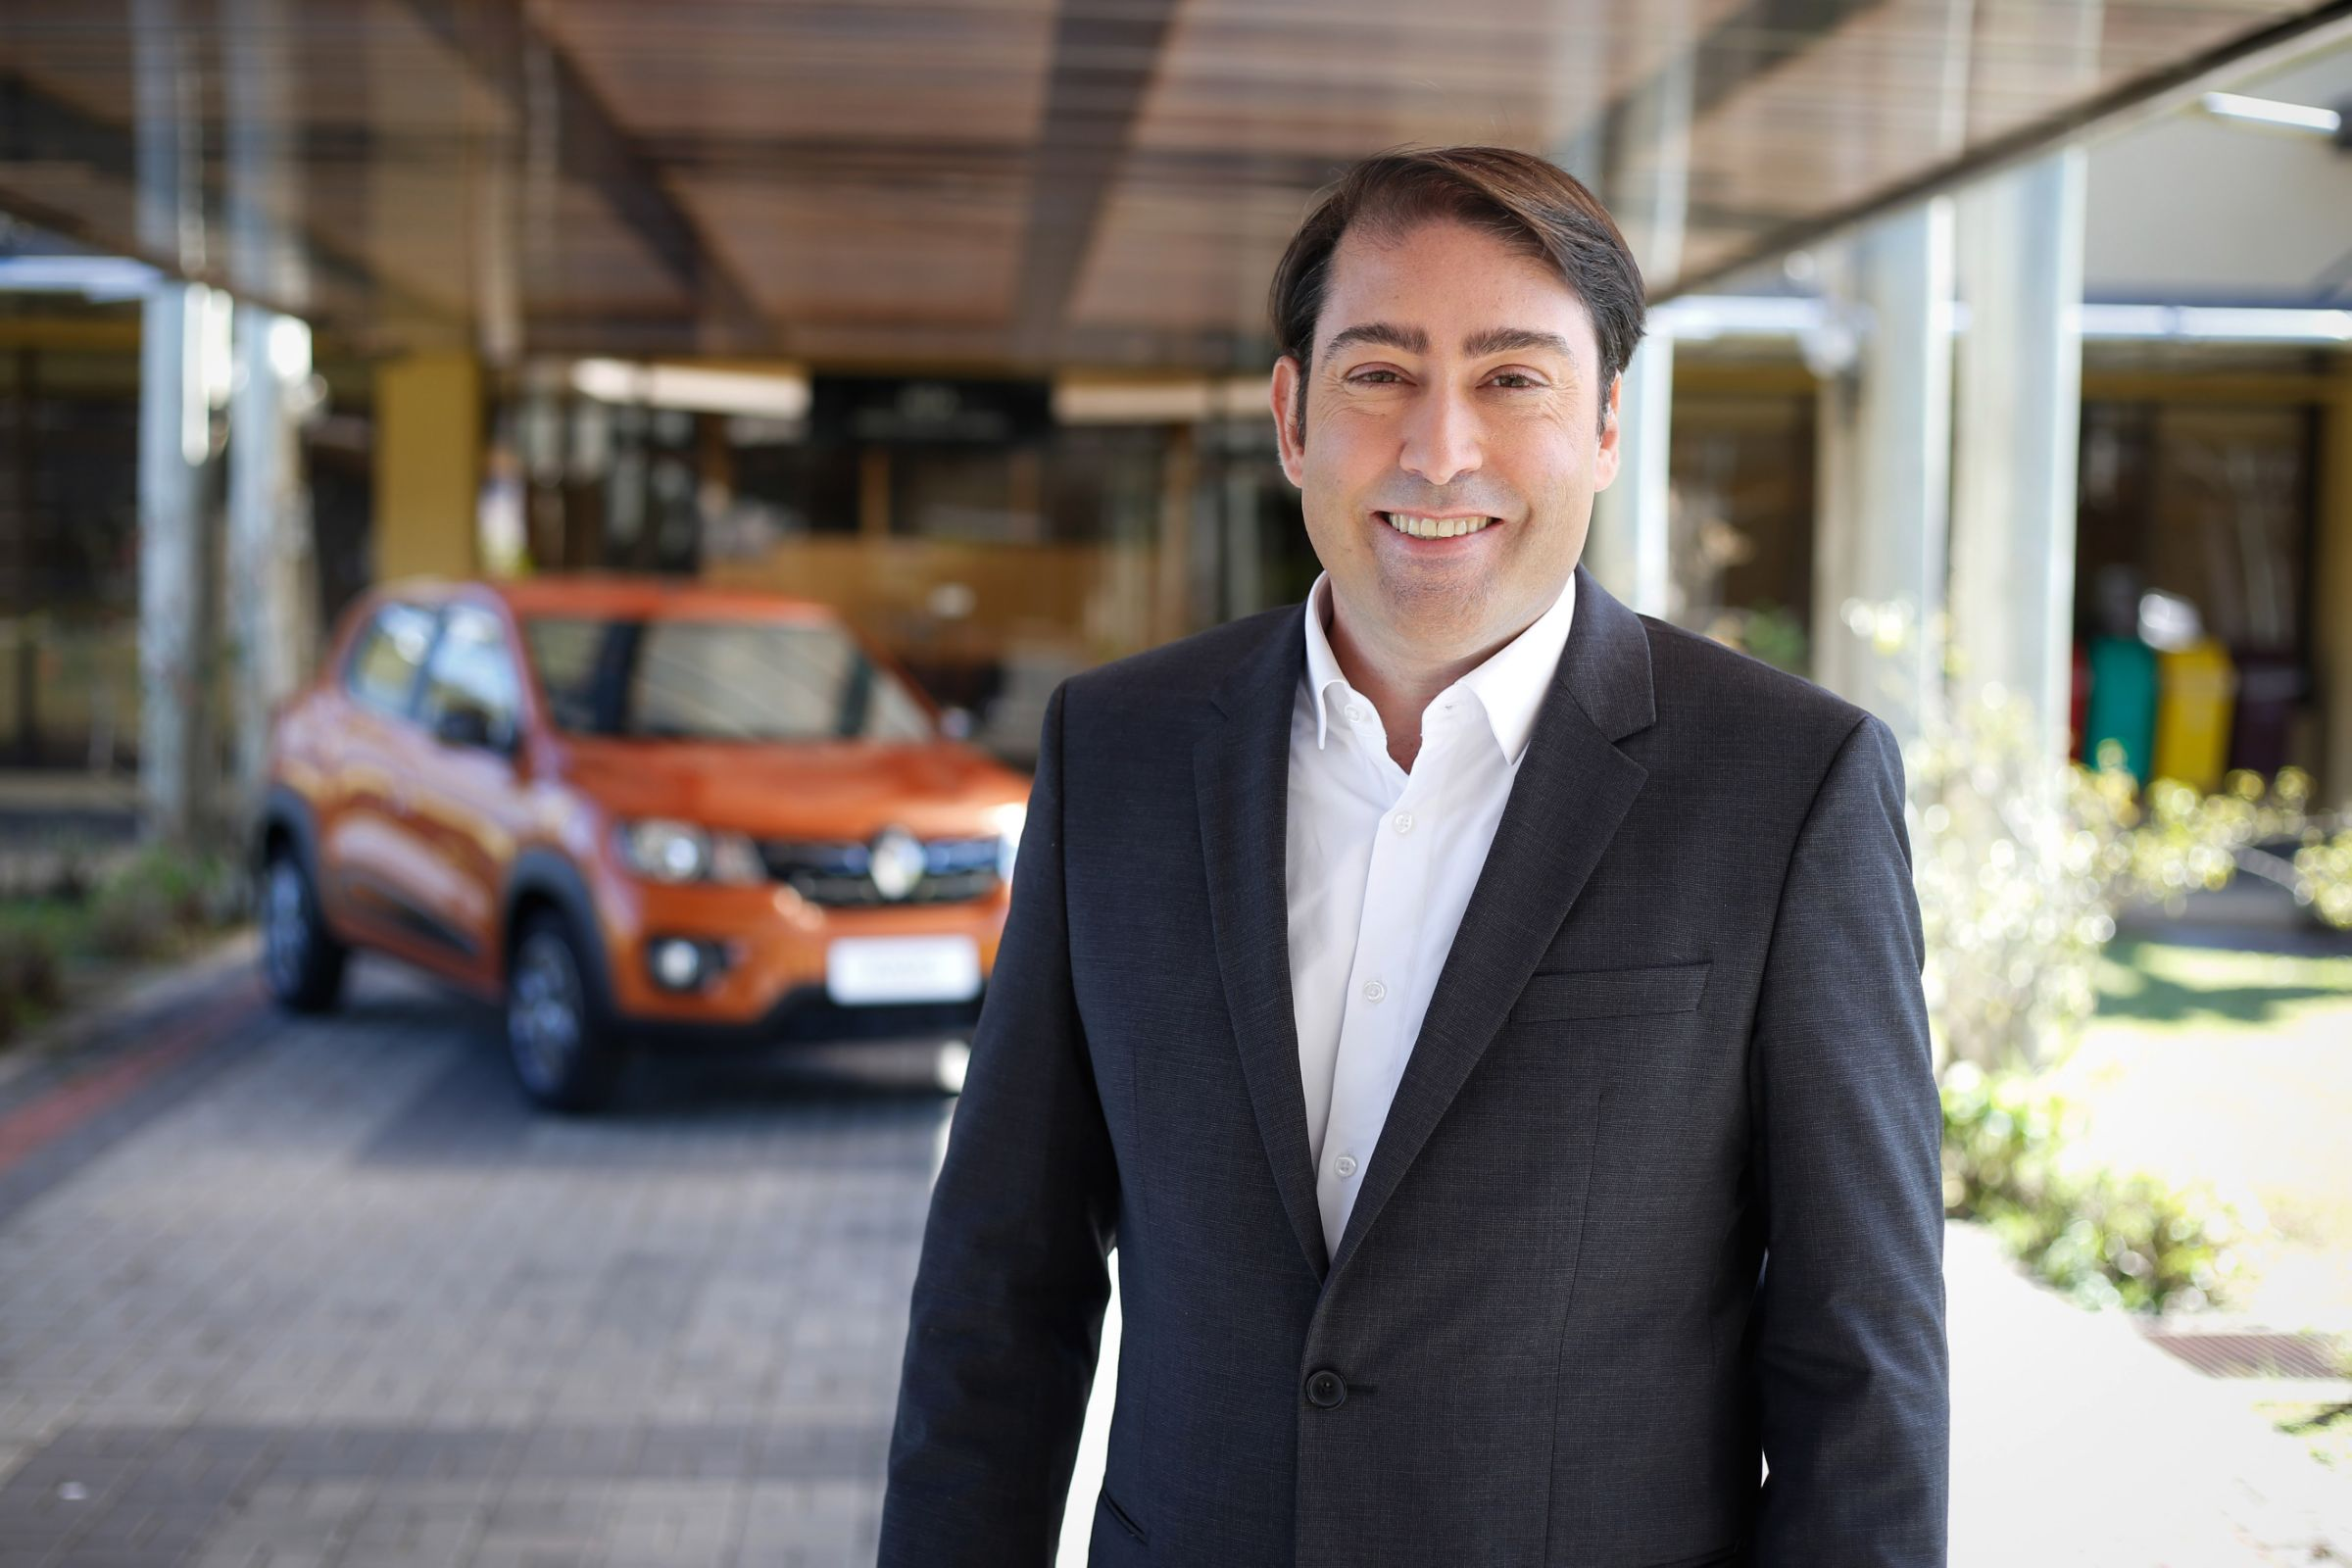 Luiz Pedrucci, presidente da Renault na América do Sul